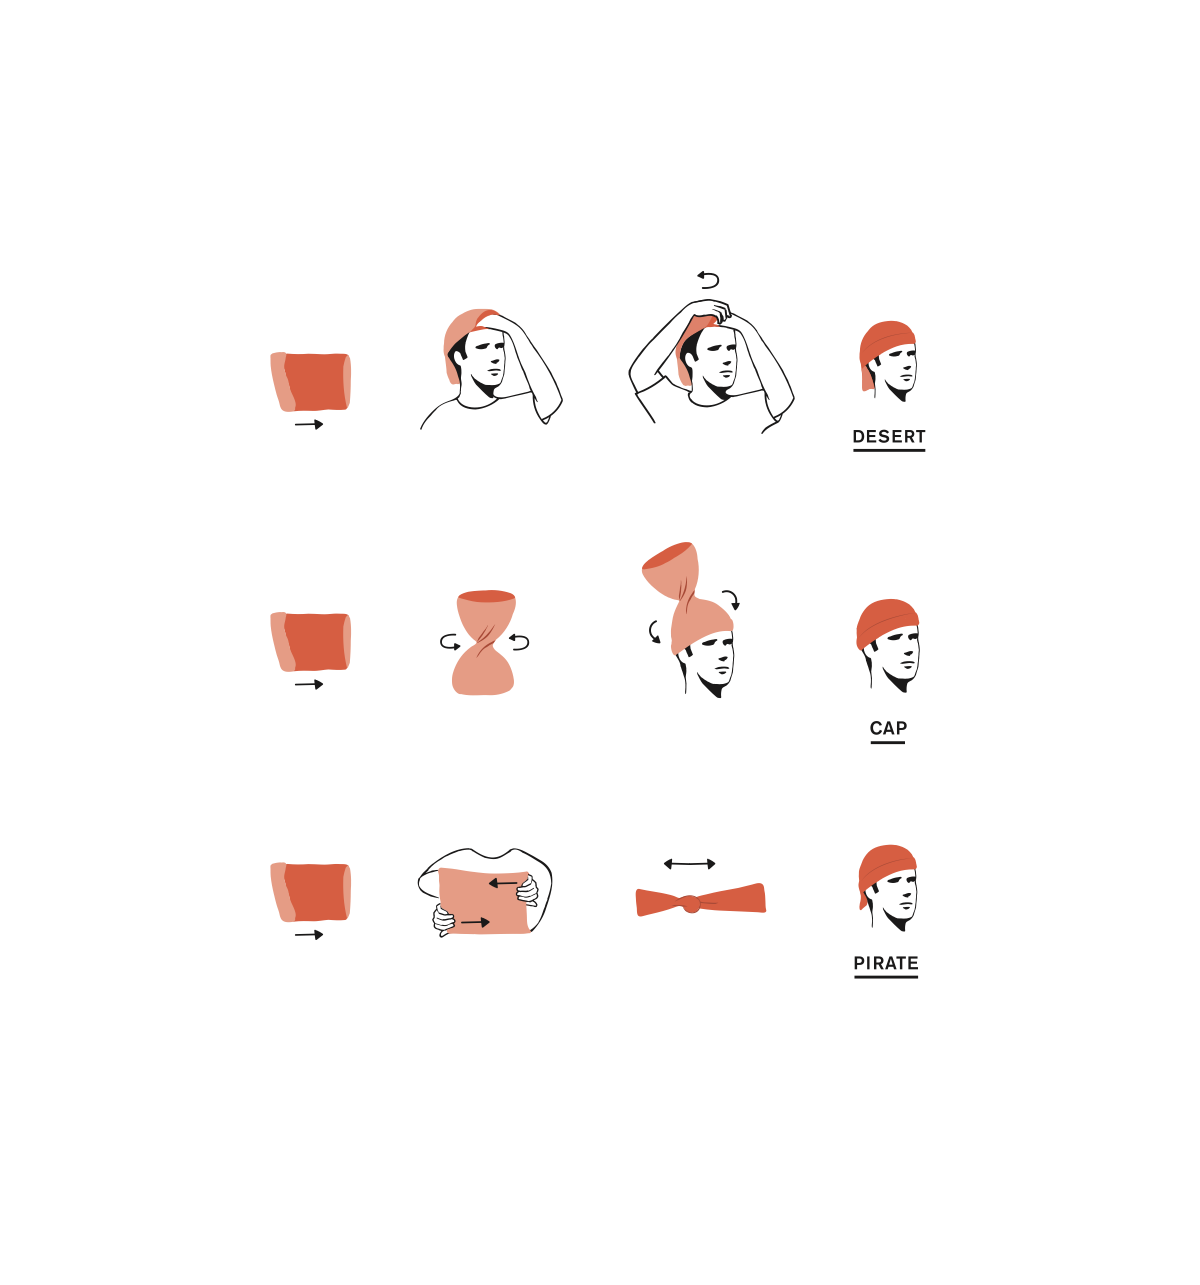 Icons / Description for How-to-Make Cap / Desert / Pirate